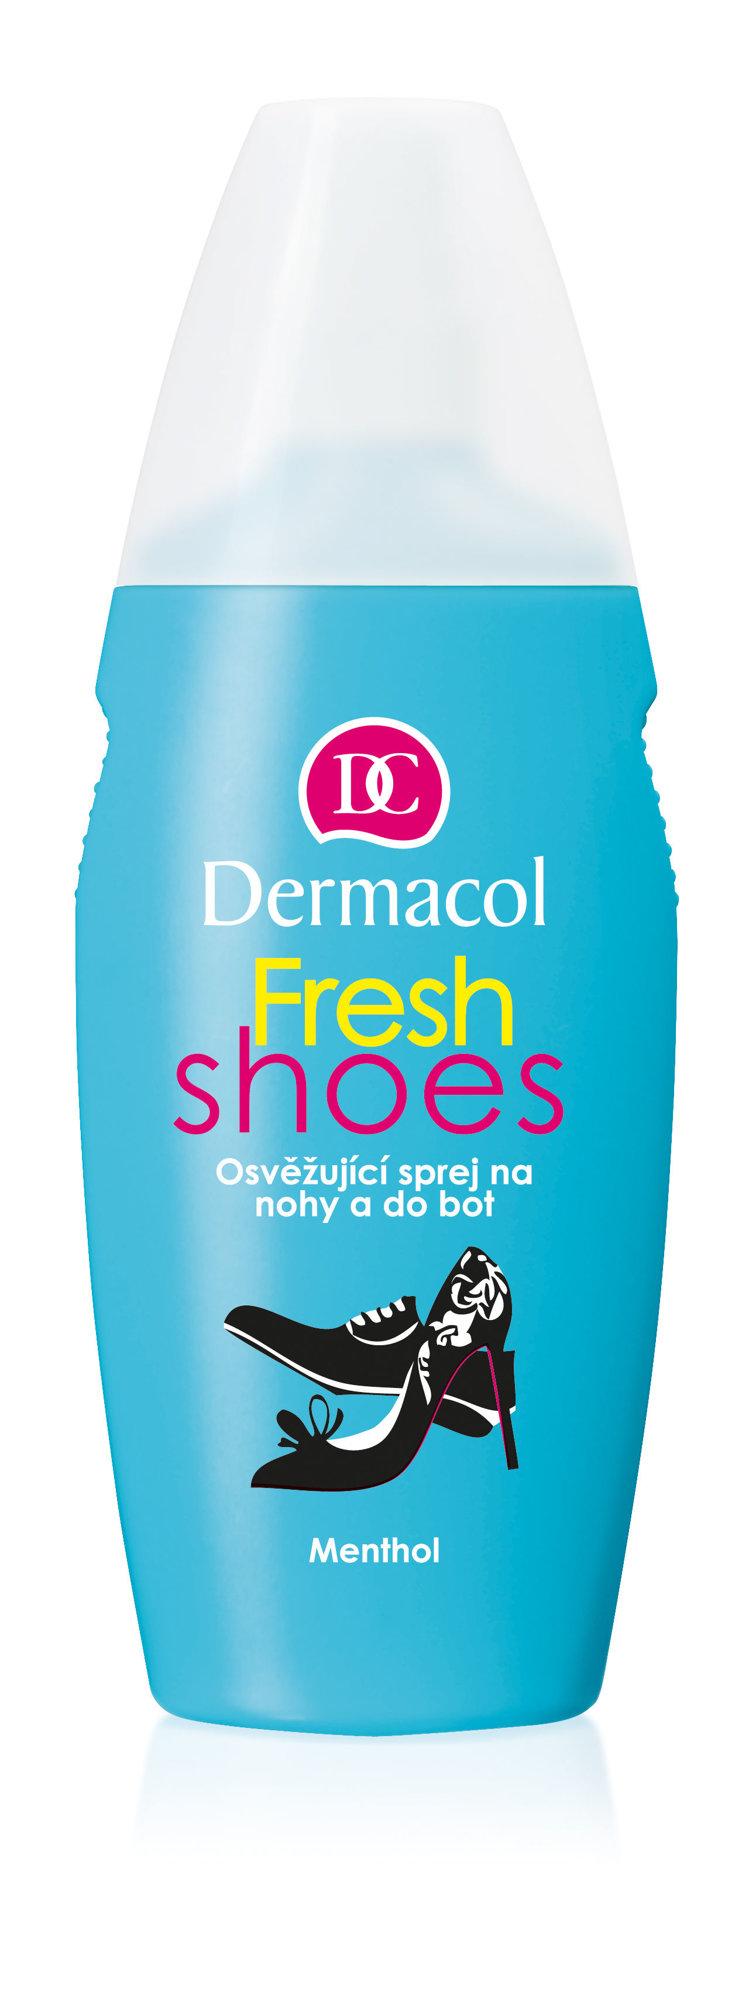 Priemonės rankoms ir pėdoms Dermacol Fresh Shoes